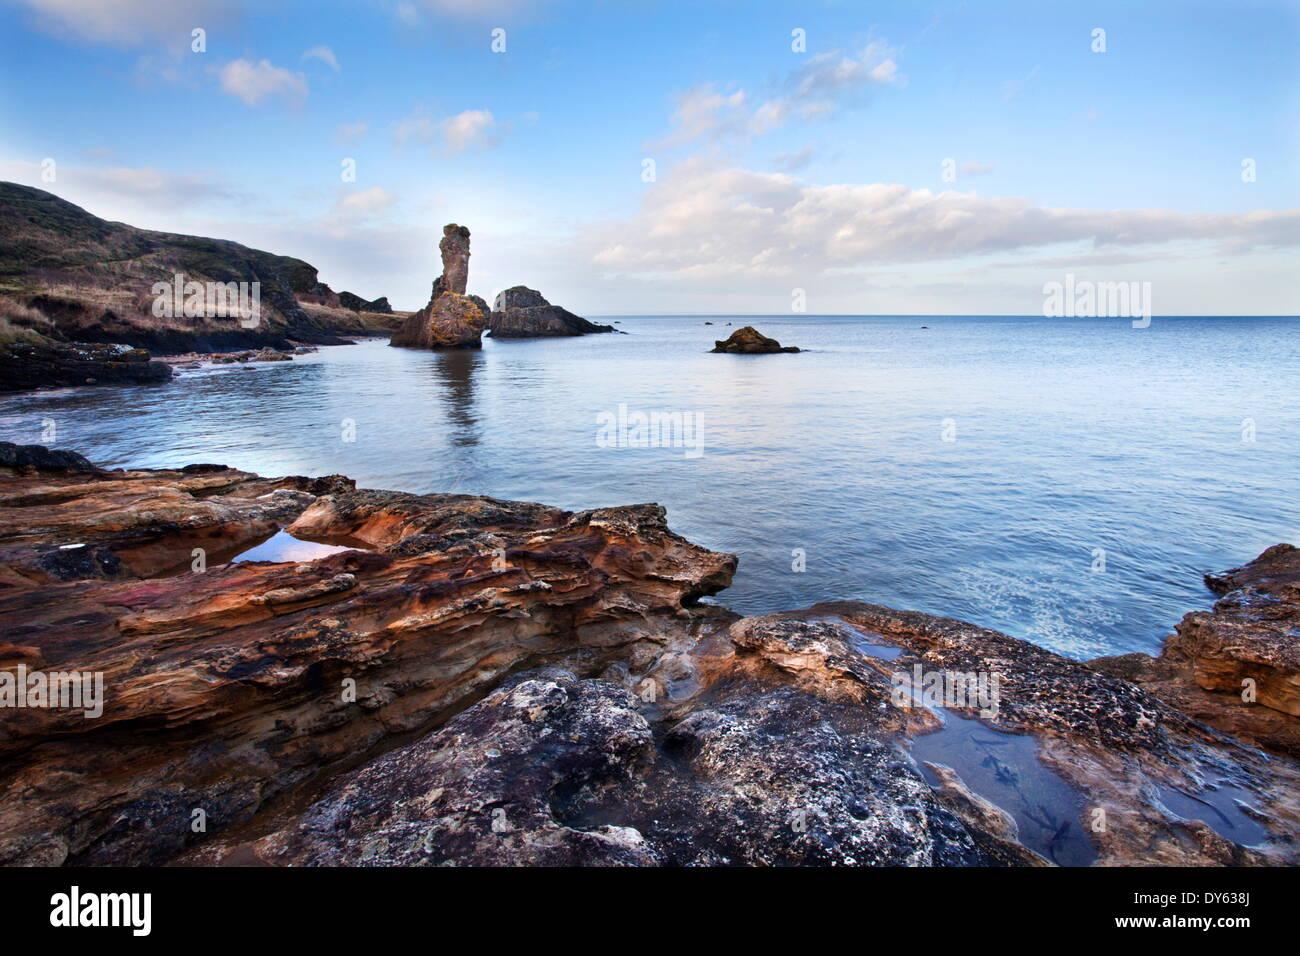 Rock and Spindle on the Fife Coast near St, Andrews, Fife, Scotland, United Kingdom, Europe - Stock Image